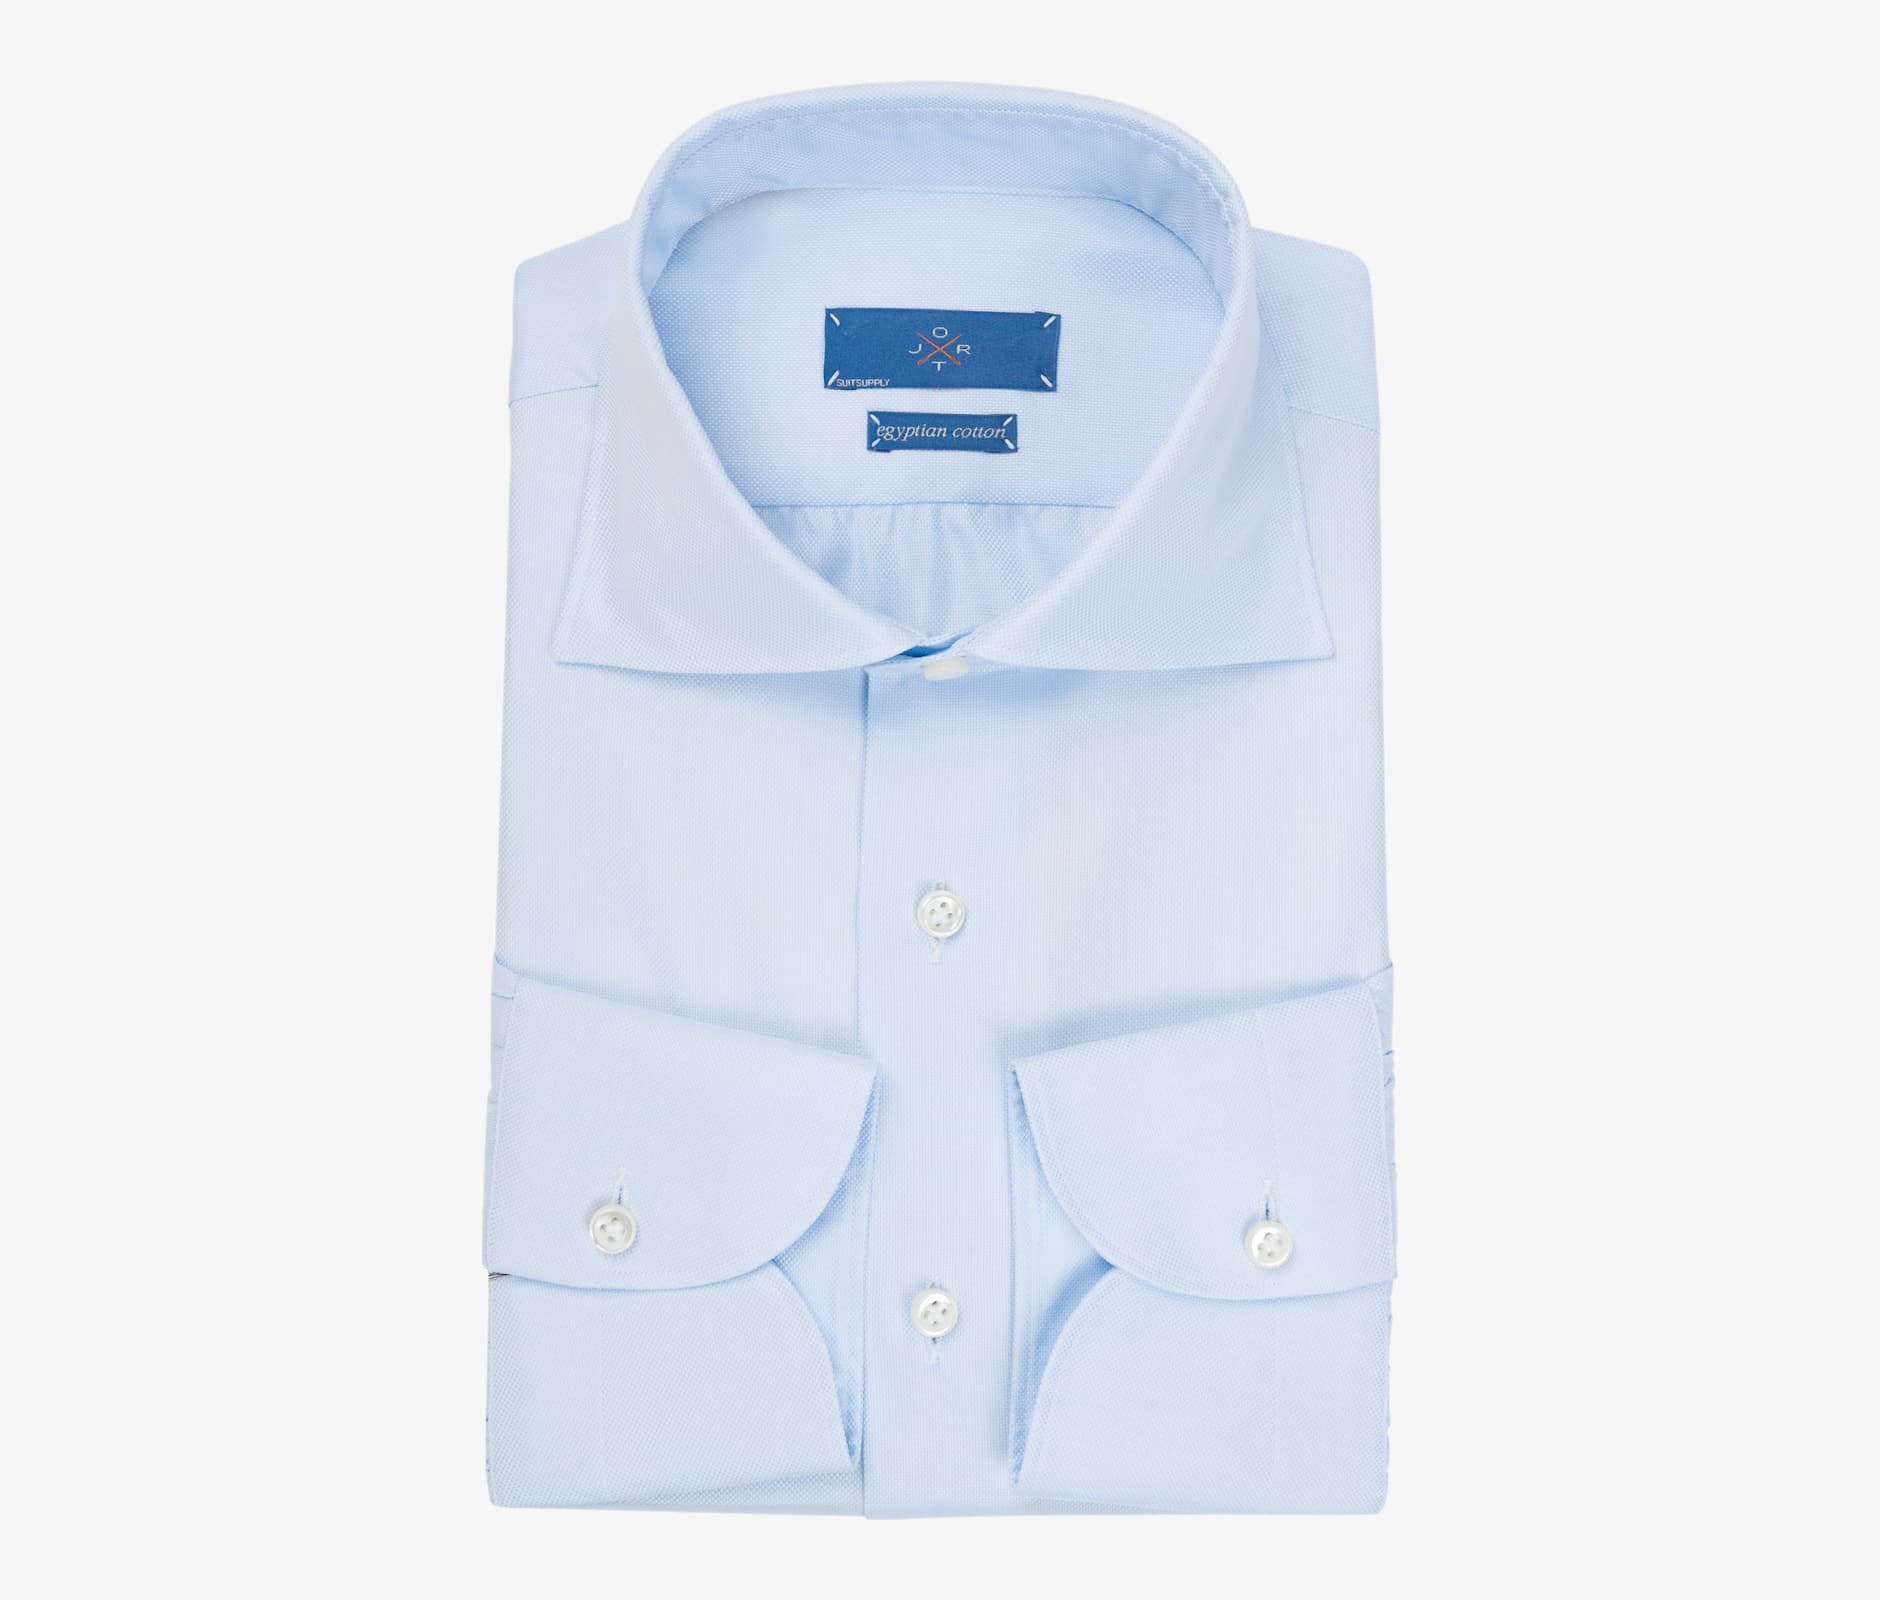 Jort_Light_Blue_Shirt_Single_Cuff_SH112B-J